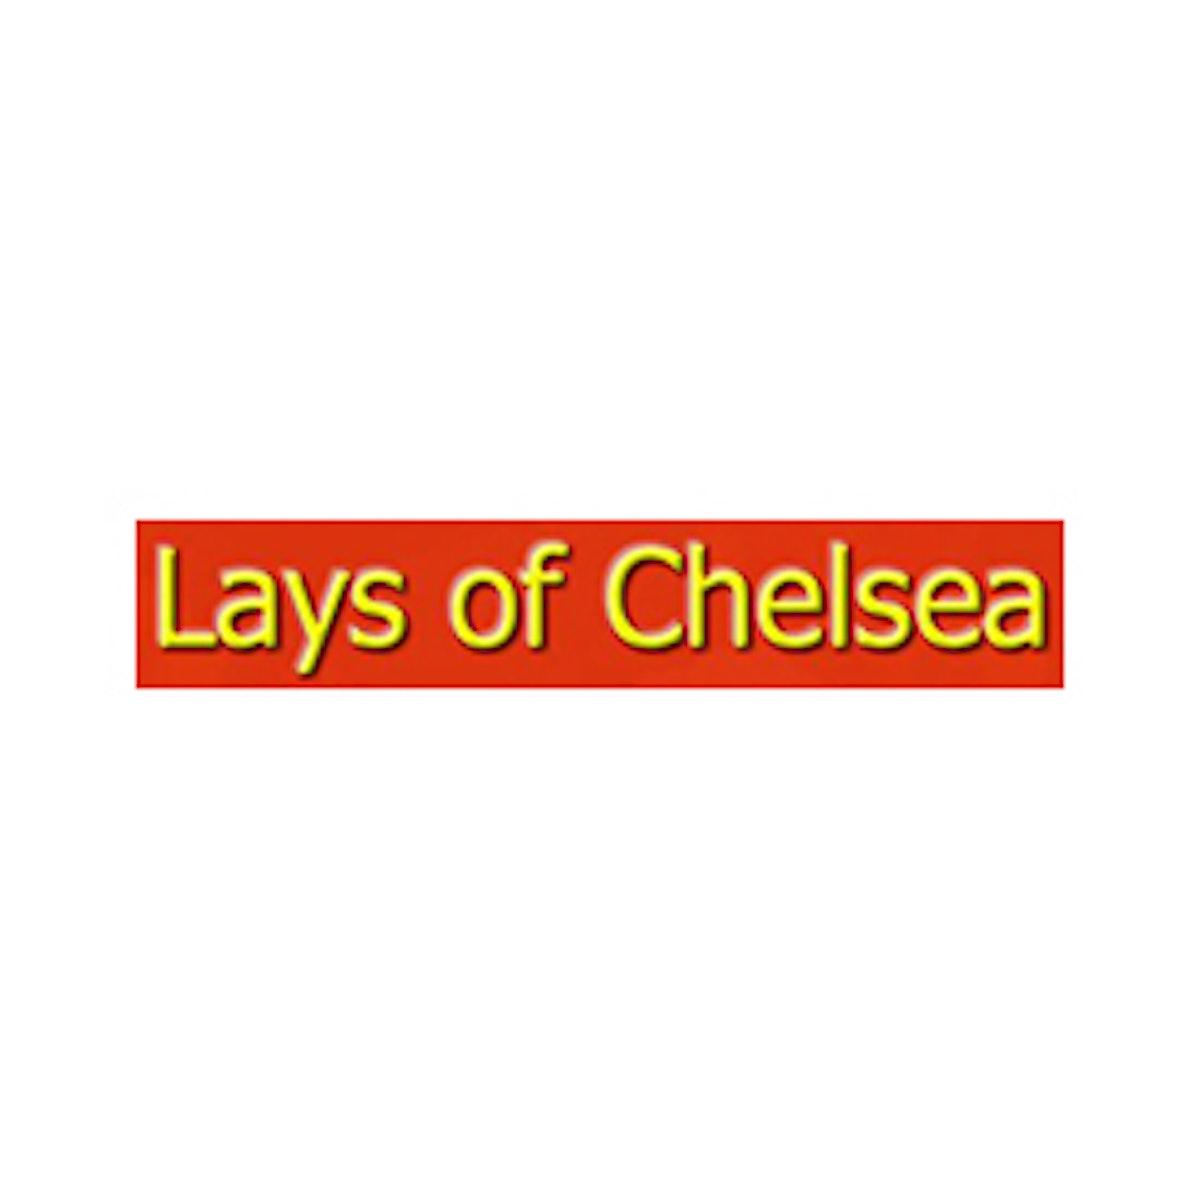 Lays Of Chelsea